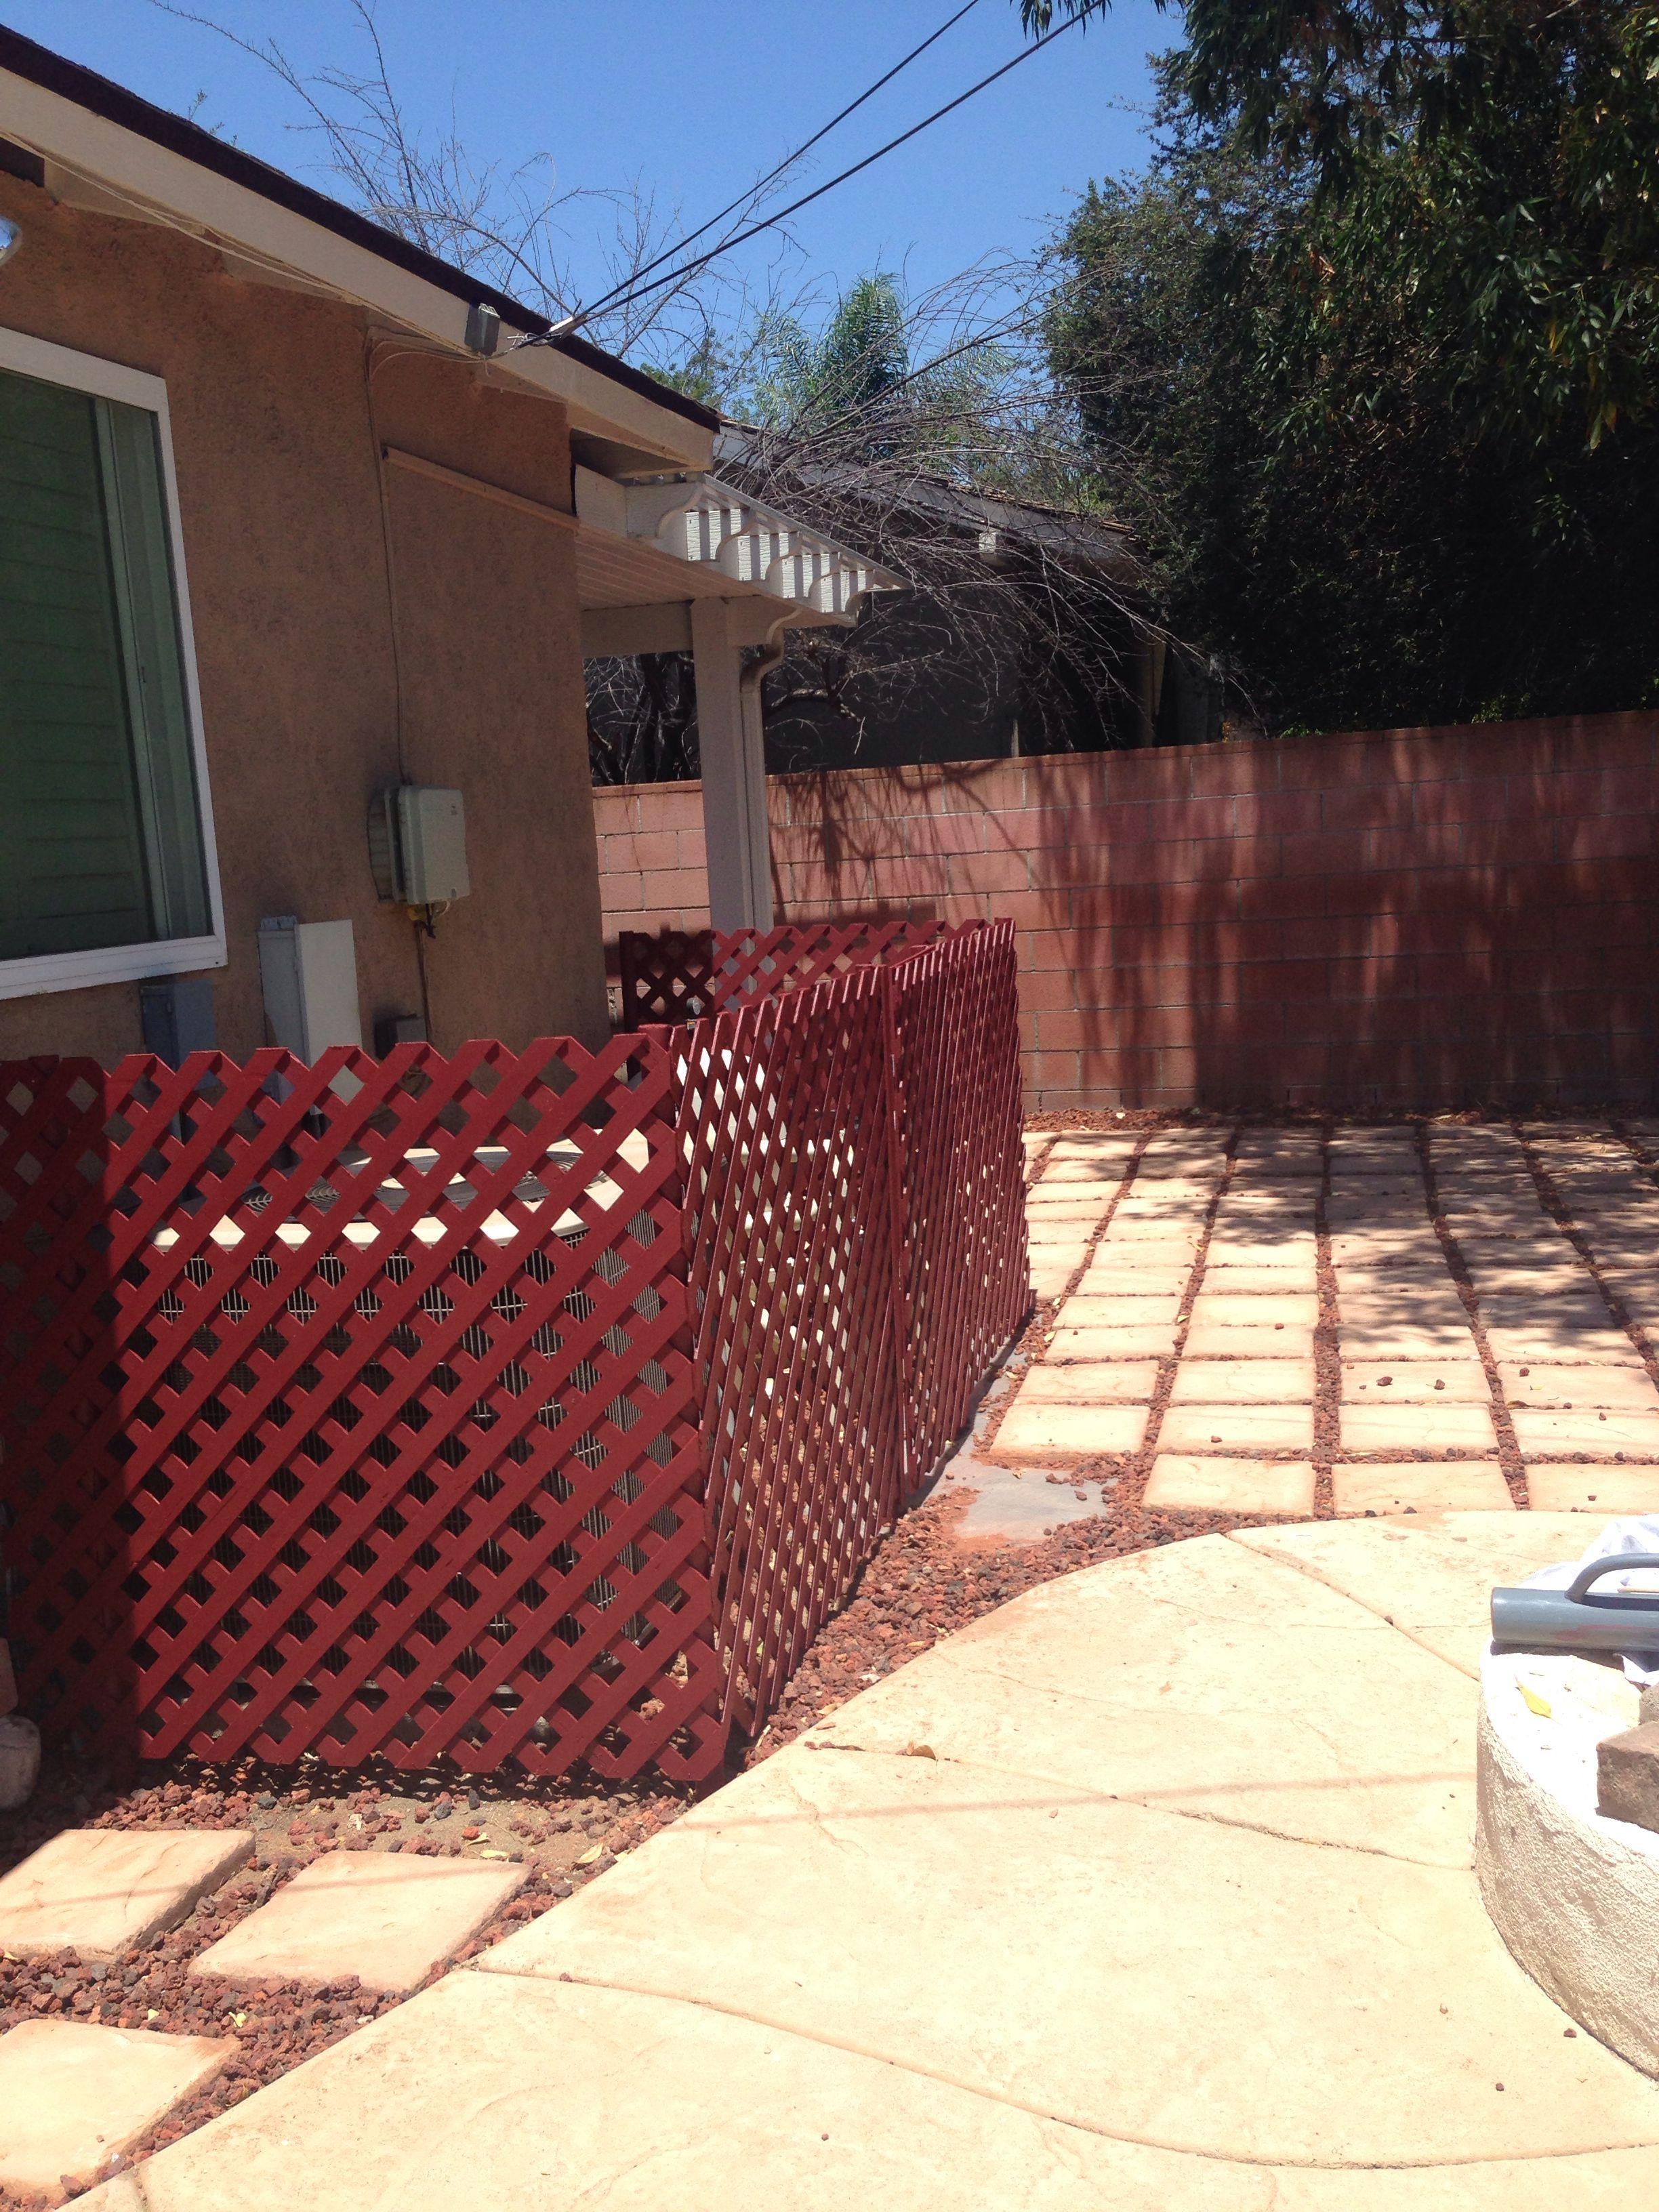 A C Pool Pump Cover Homedepot Project Backyard Pool Backyard Patio